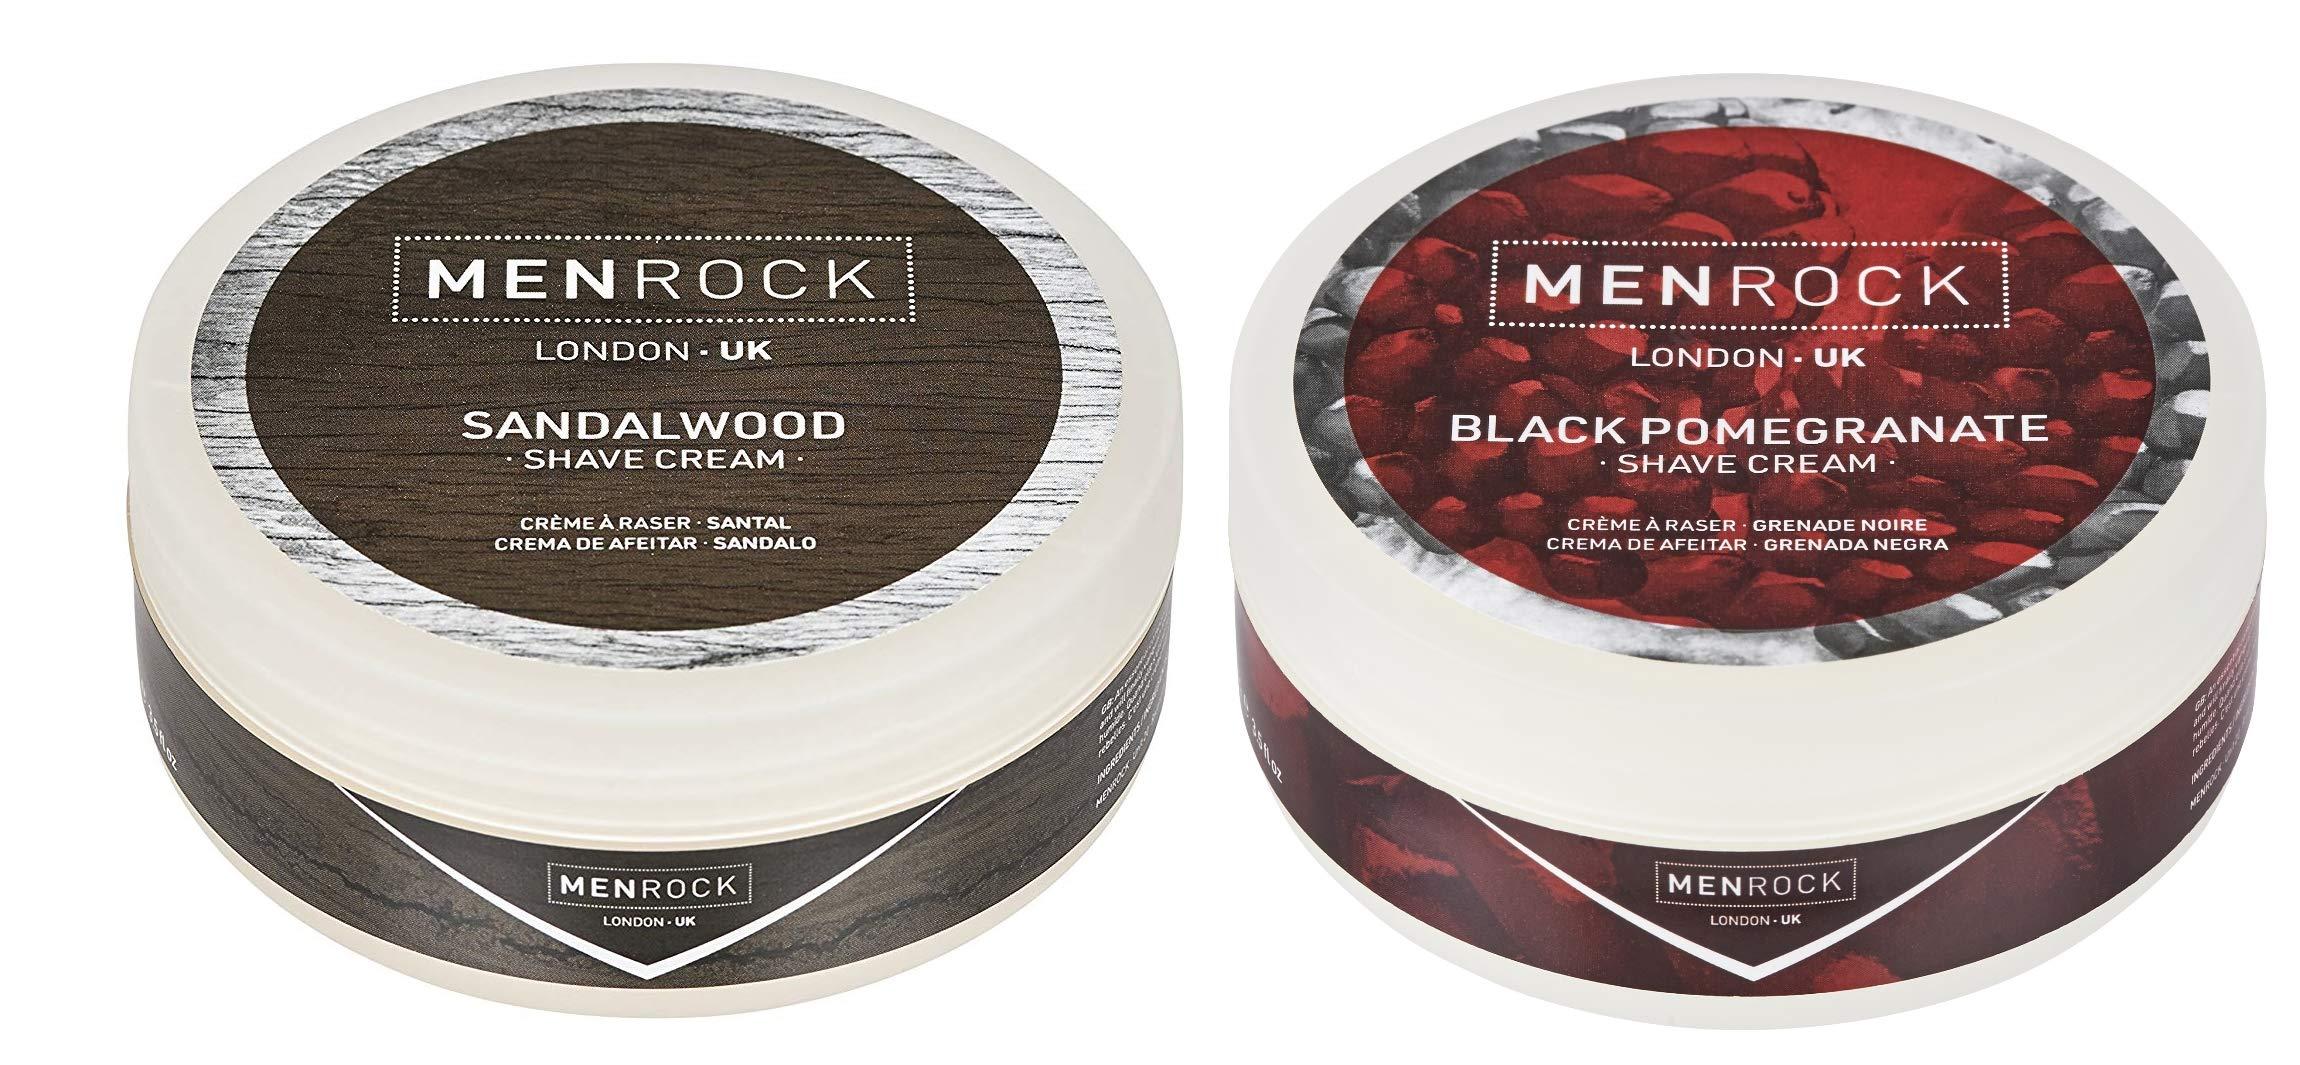 Men Rock Sandalwood Shaving Cream and Black Pomegranate Shave Cream - Non Aerosol Shaving Cream, Premium Shaving Sensitive Skin, Moisturizing Shaving Cream for Men - Shaving Cream 2 Pack, 3.4 Oz.